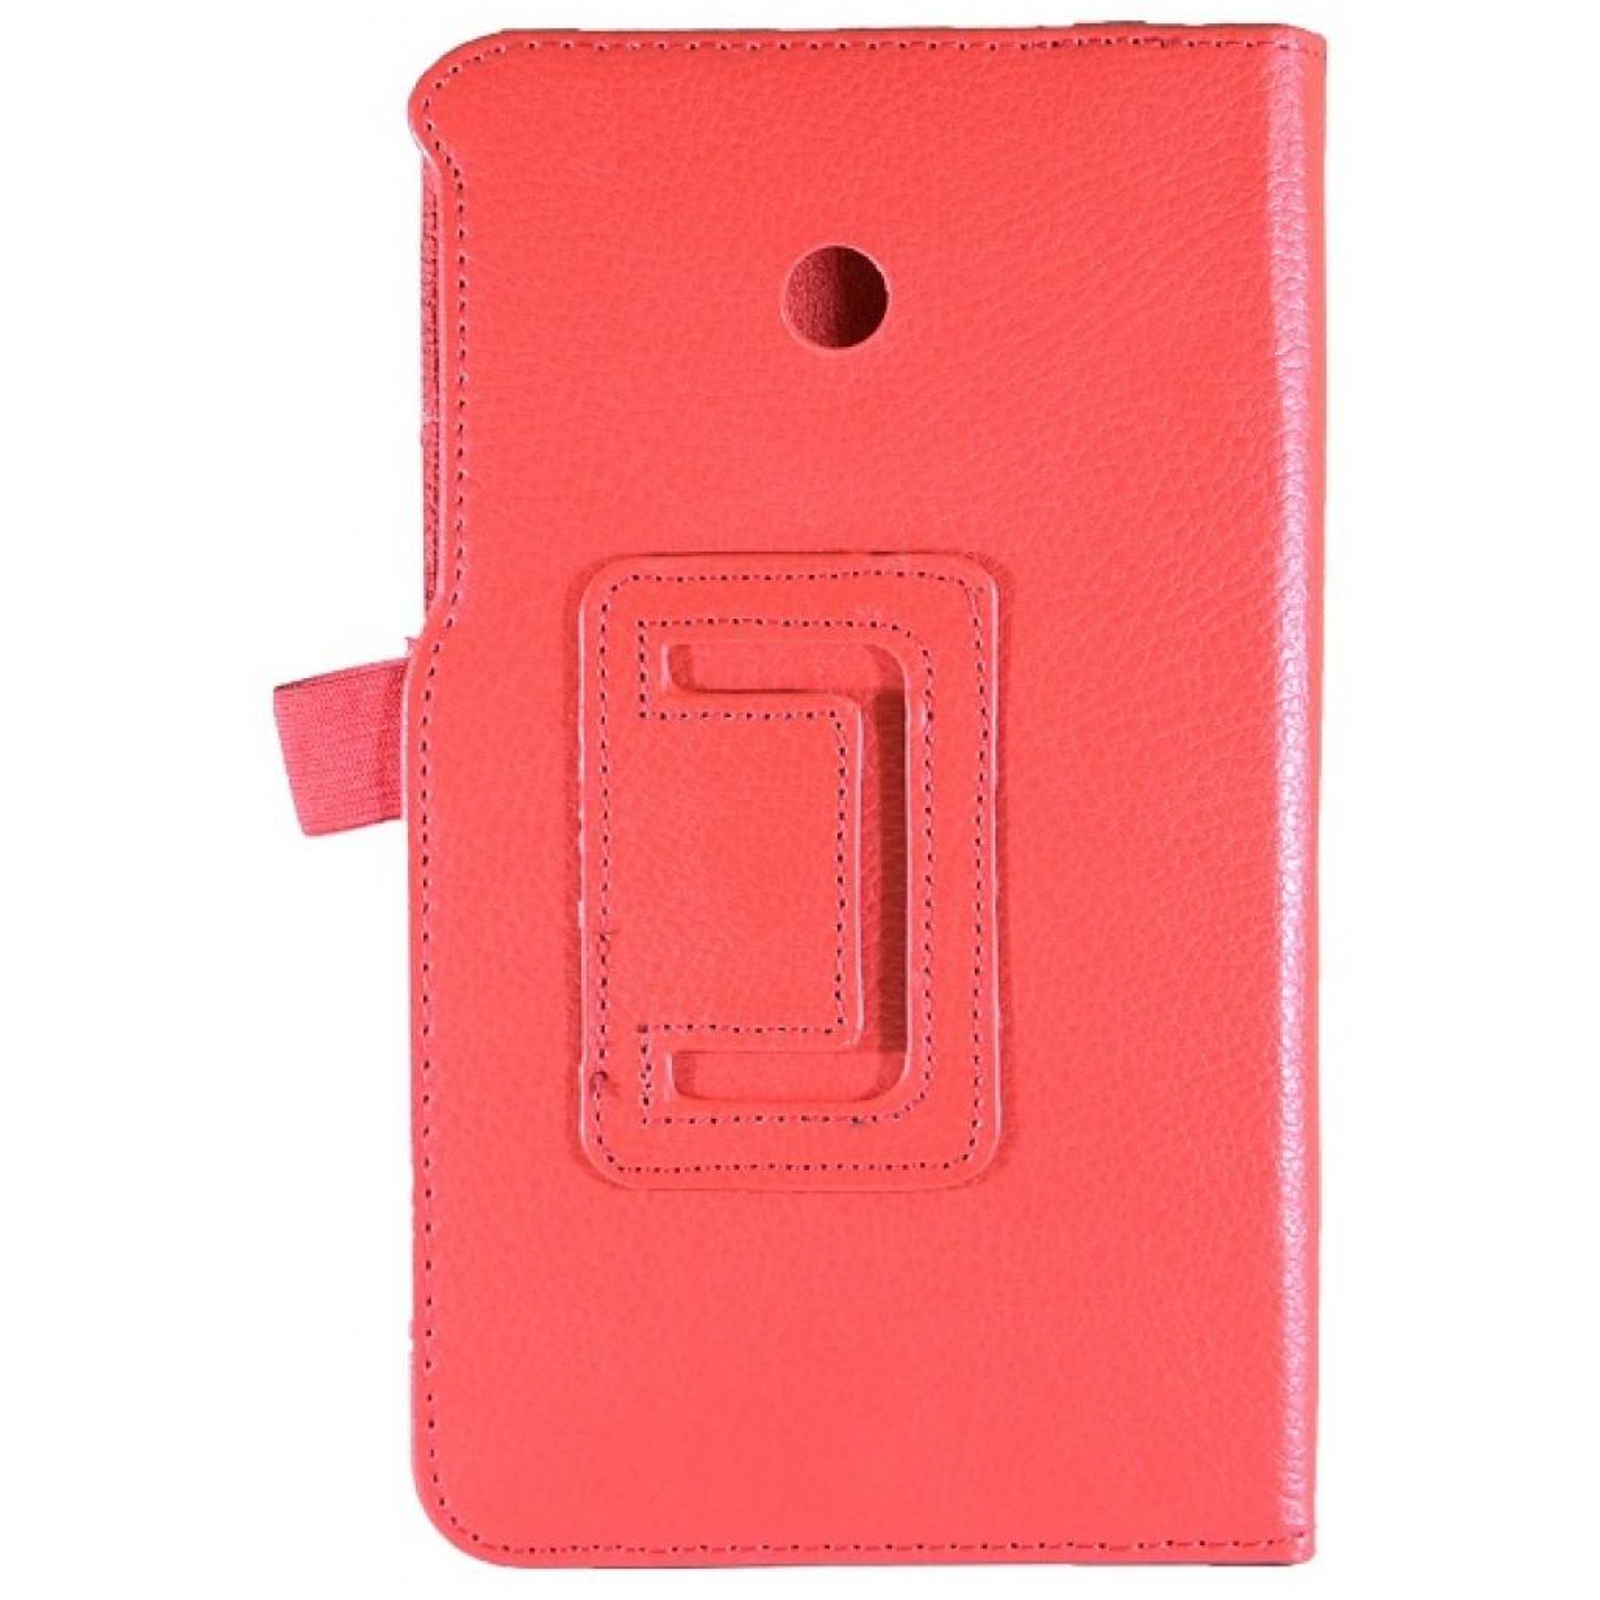 "Чехол для планшета Pro-case 7"" Asus MeMO Pad ME170 red (ME170r) изображение 2"